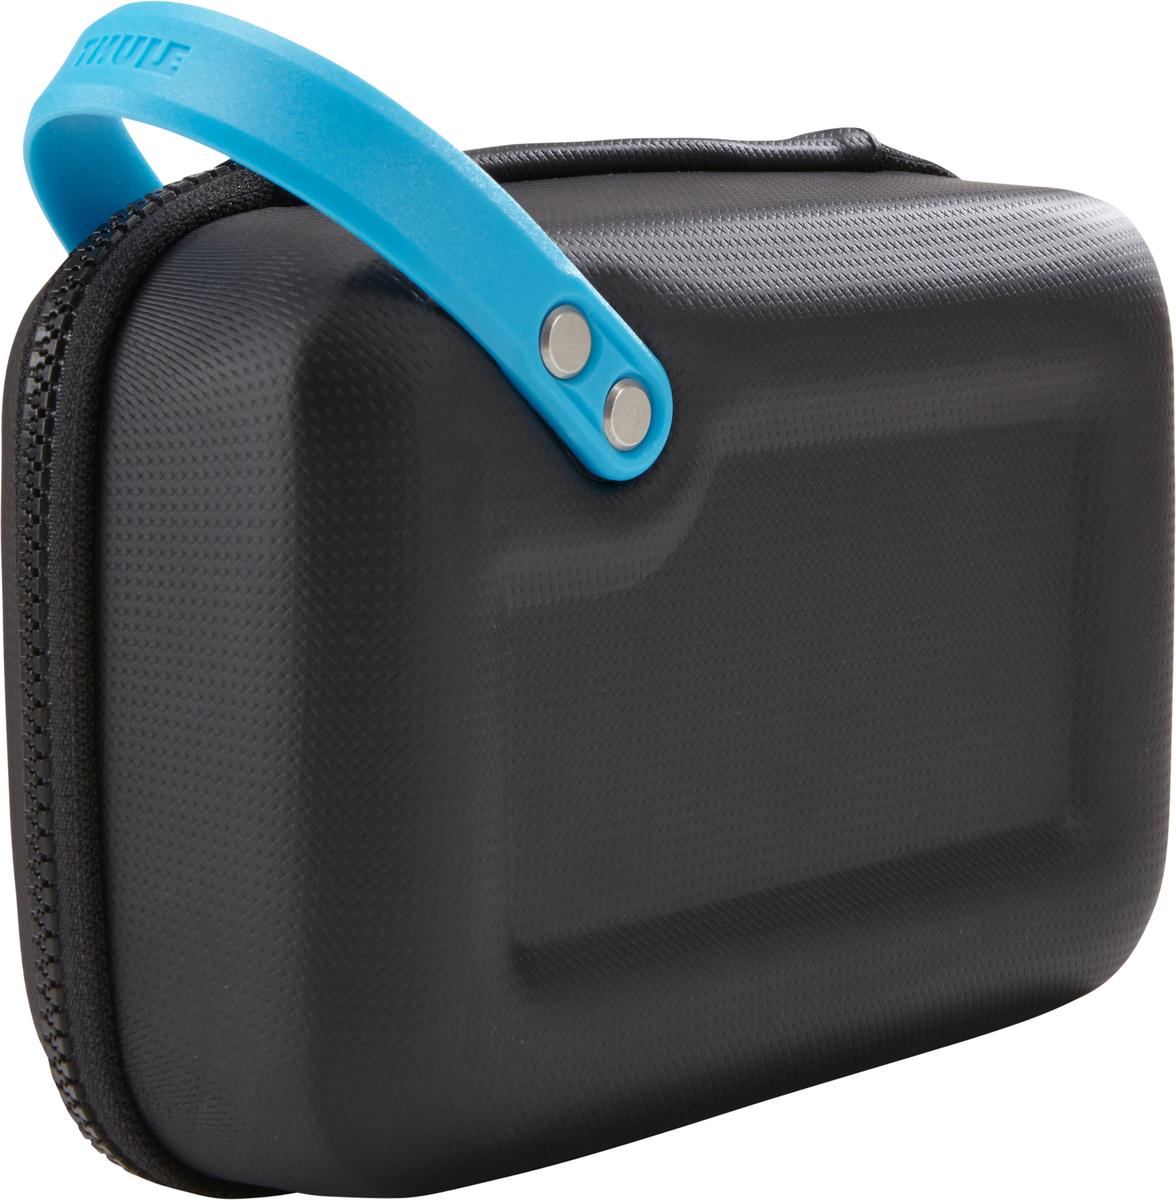 "Чехол для экшн-камеры Thule ""Legend GoPro Case"", цвет: черный, 21 x 8 x 15 см"